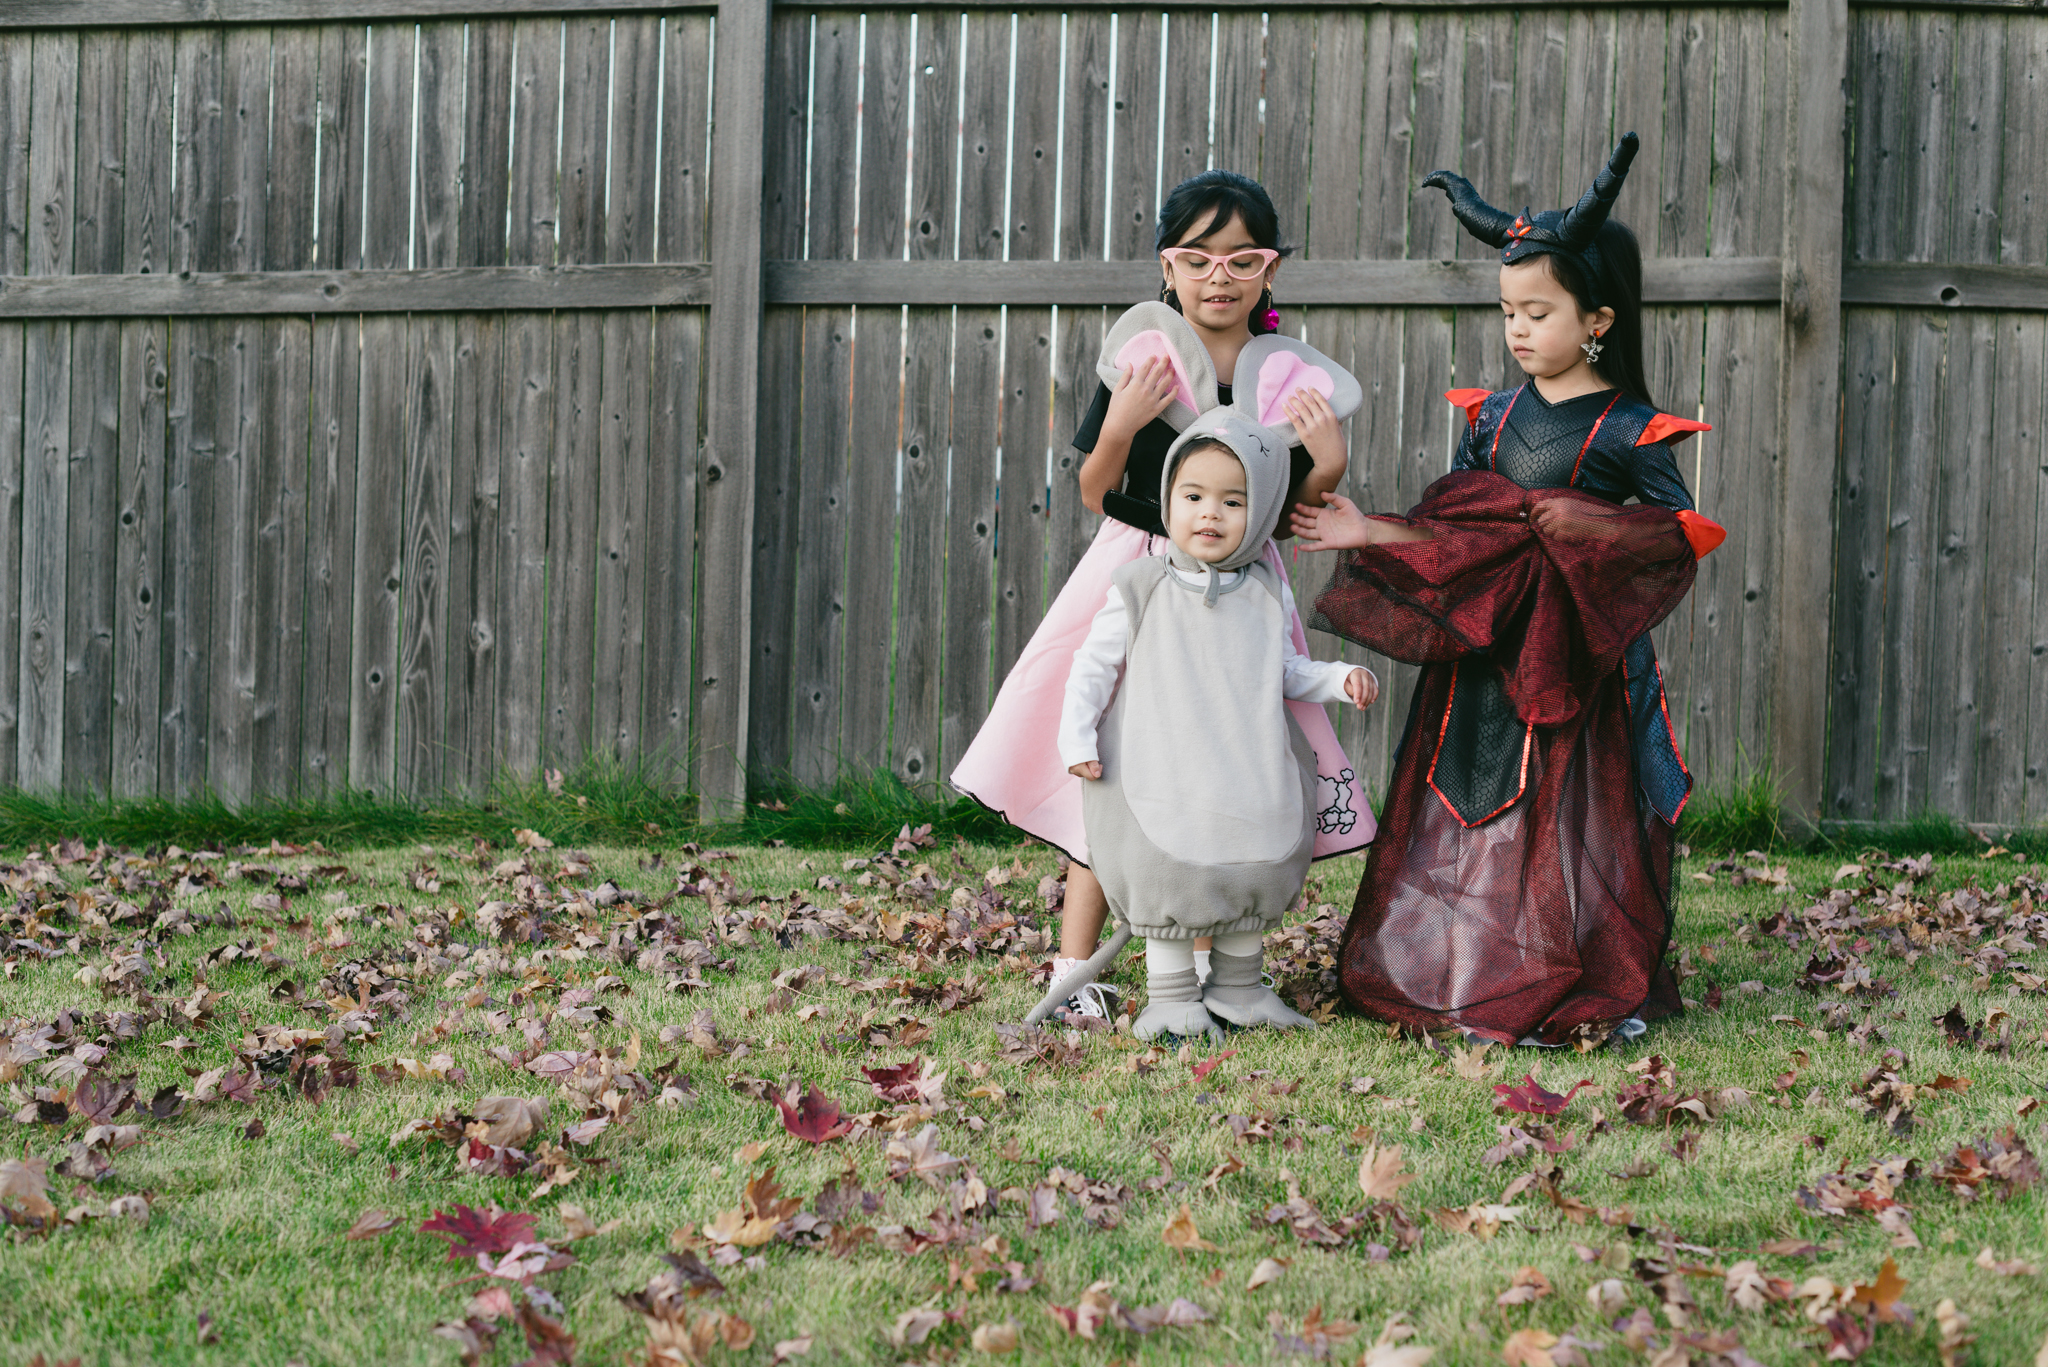 20141026-Halloween 2014-004-FBEdit.JPG